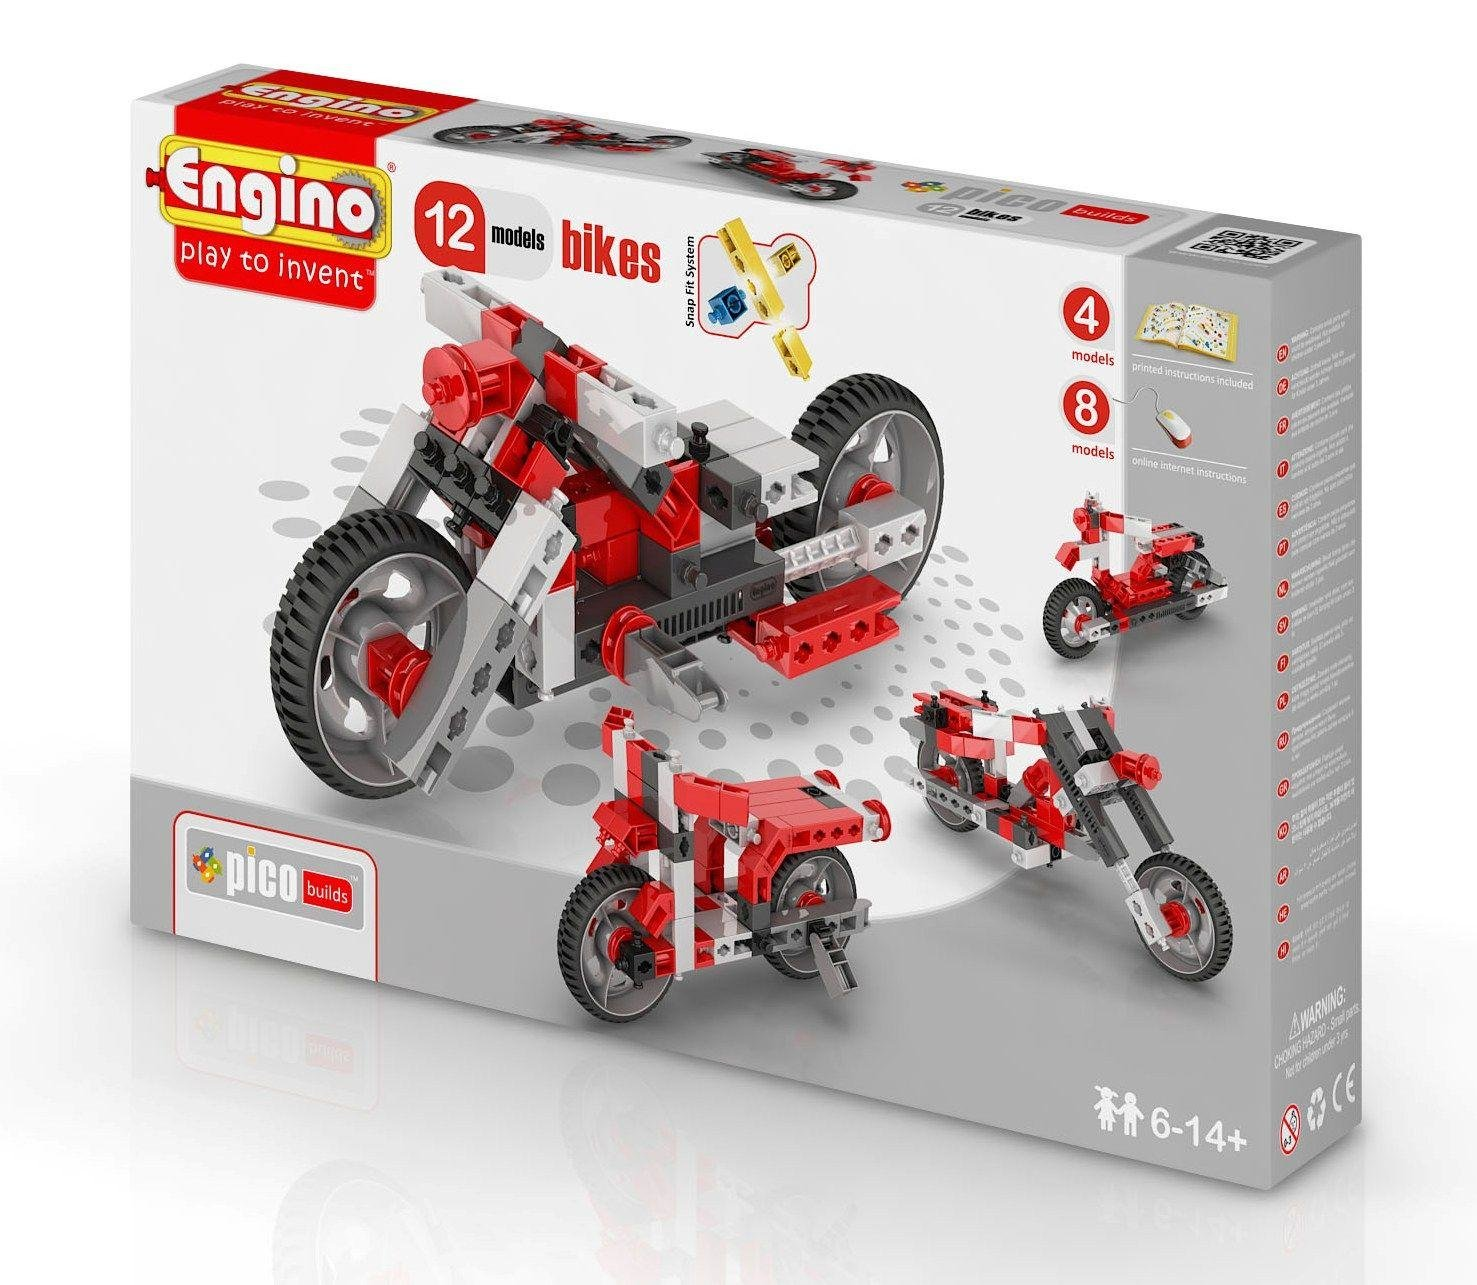 Конструктор Engino PICO BUILDS|INVENTOR Мотоциклы - 12 моделей ст.15 - PB32(1232)